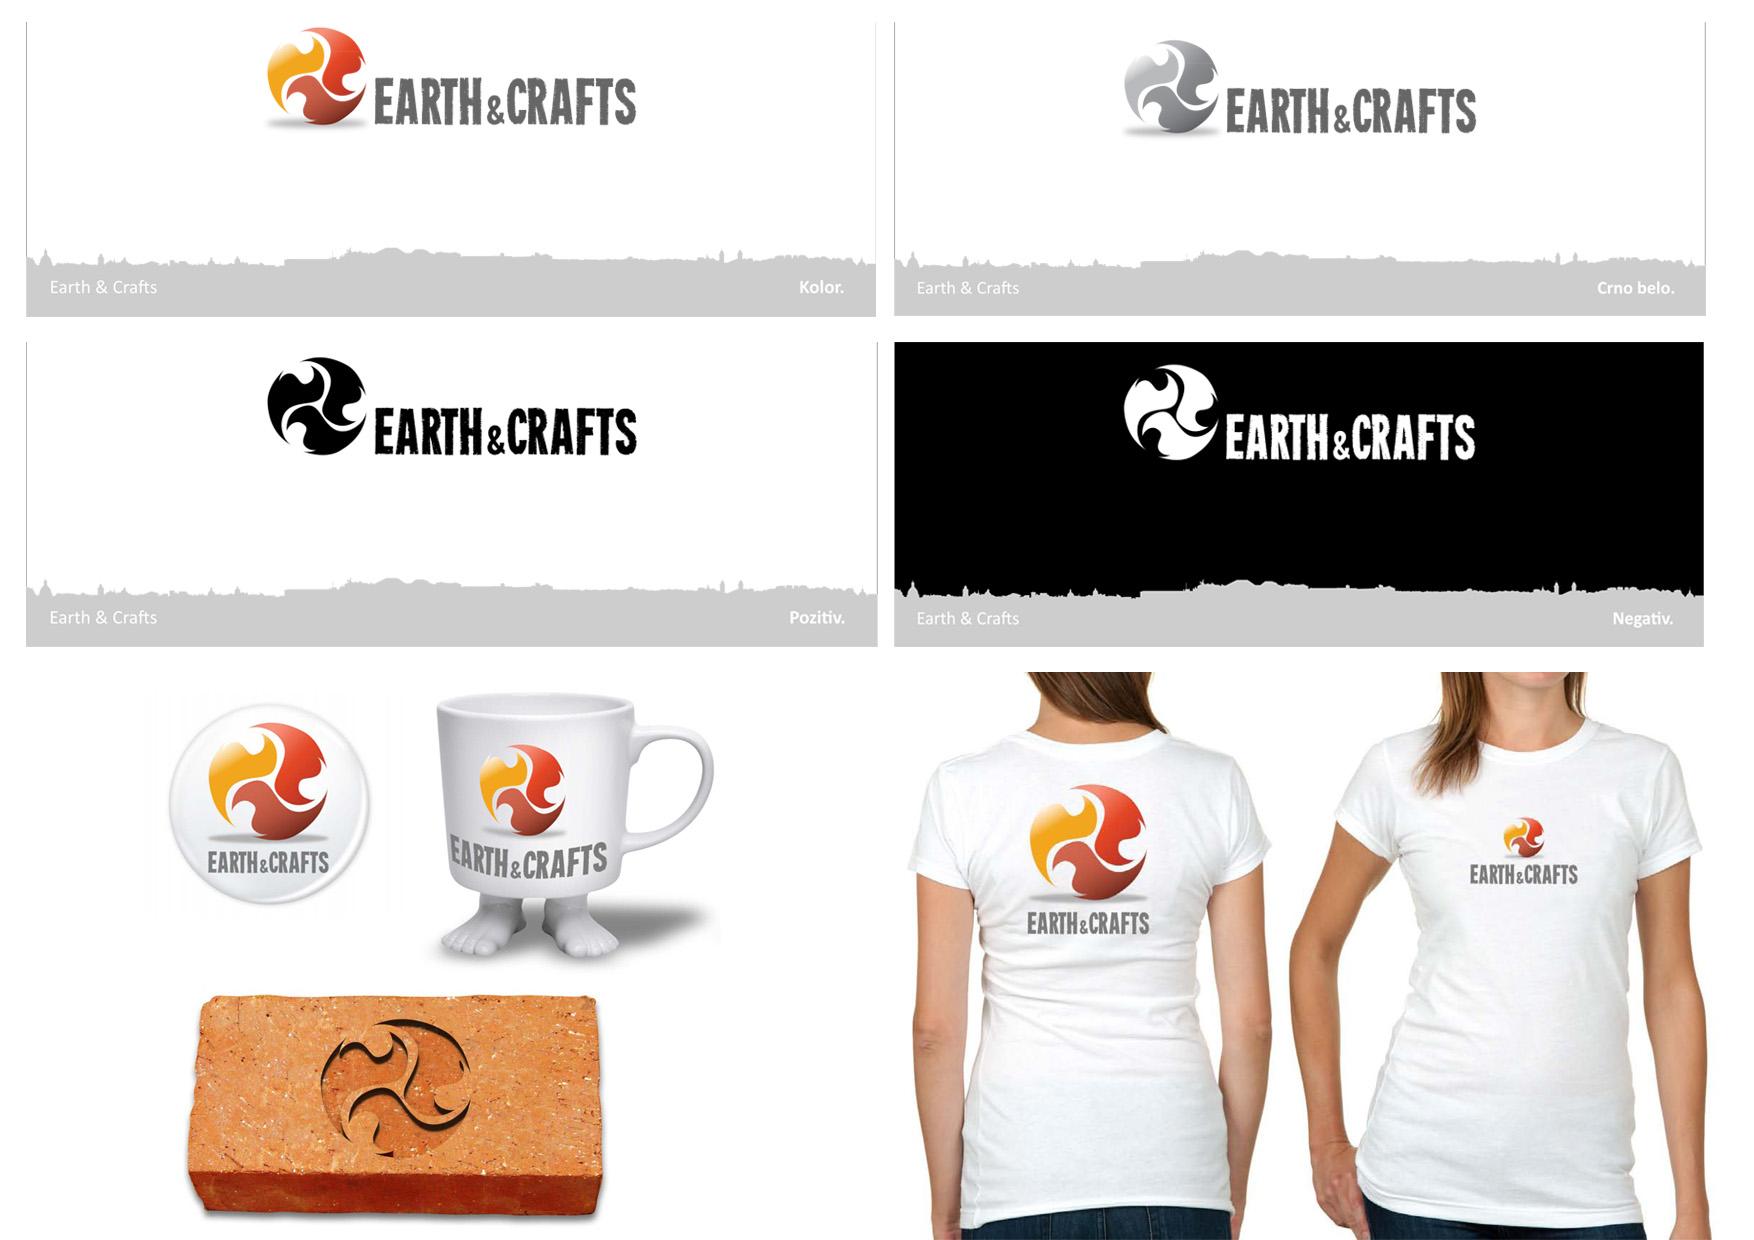 10 predlog logo EARTH&CRAFTS srdjan cpku3209@gmail.com